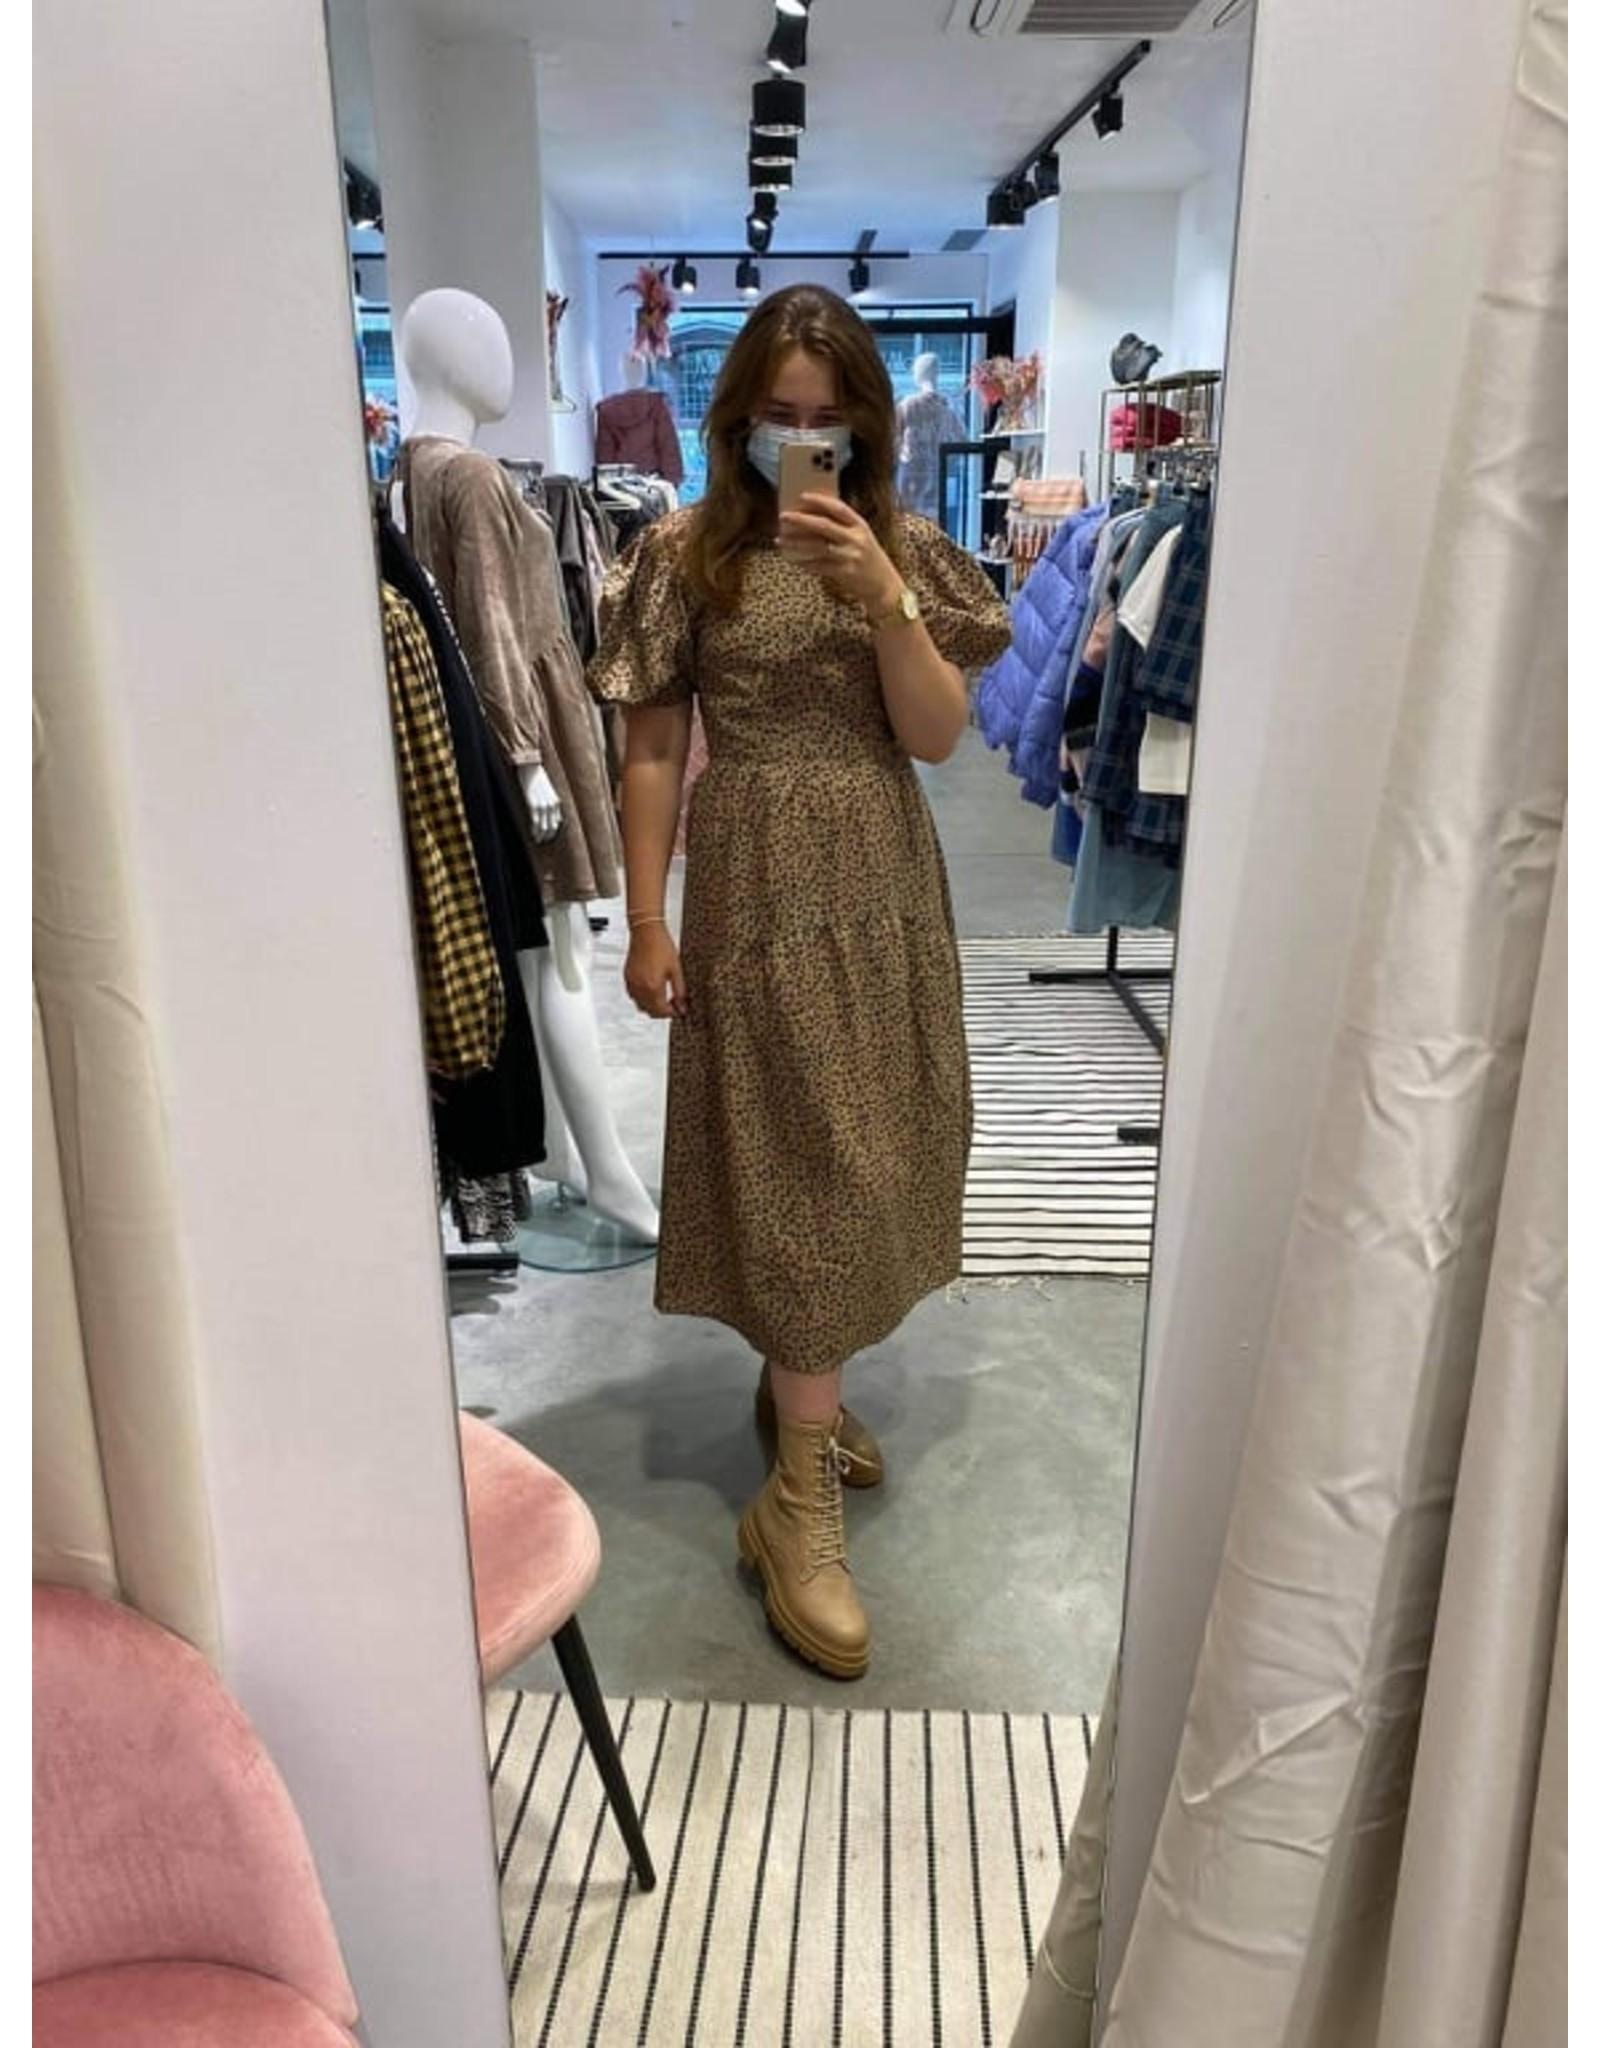 LEOPARD PUFF DRESS